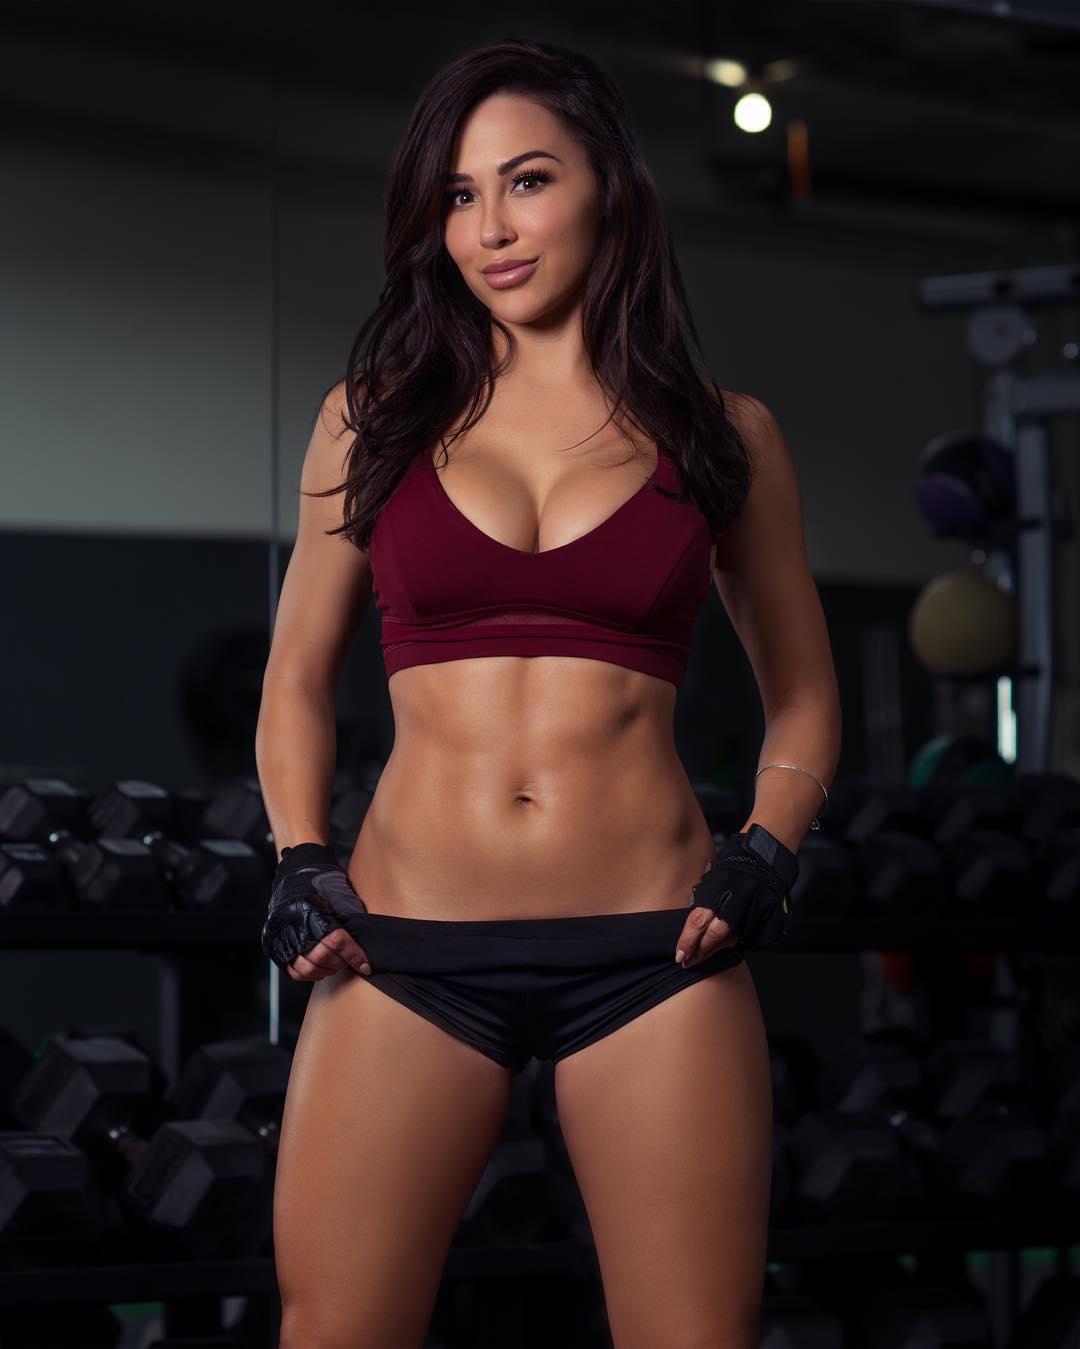 Ана чери — американская фитнес модель. ана чери — американская фитнес модель анна черри гарсия